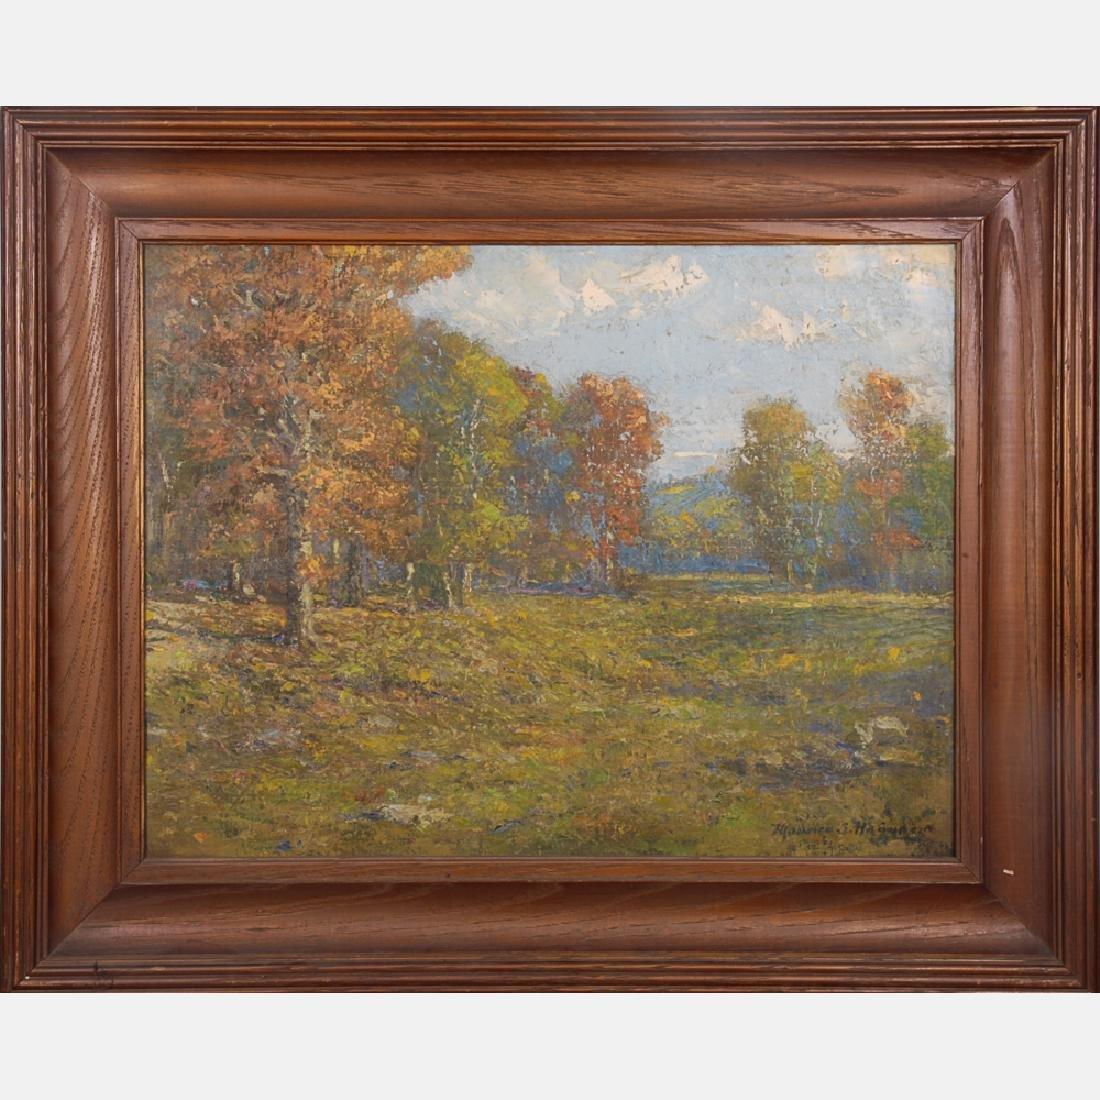 Maurice Hague (1862-1943) Stray Sunbeams, Oil on